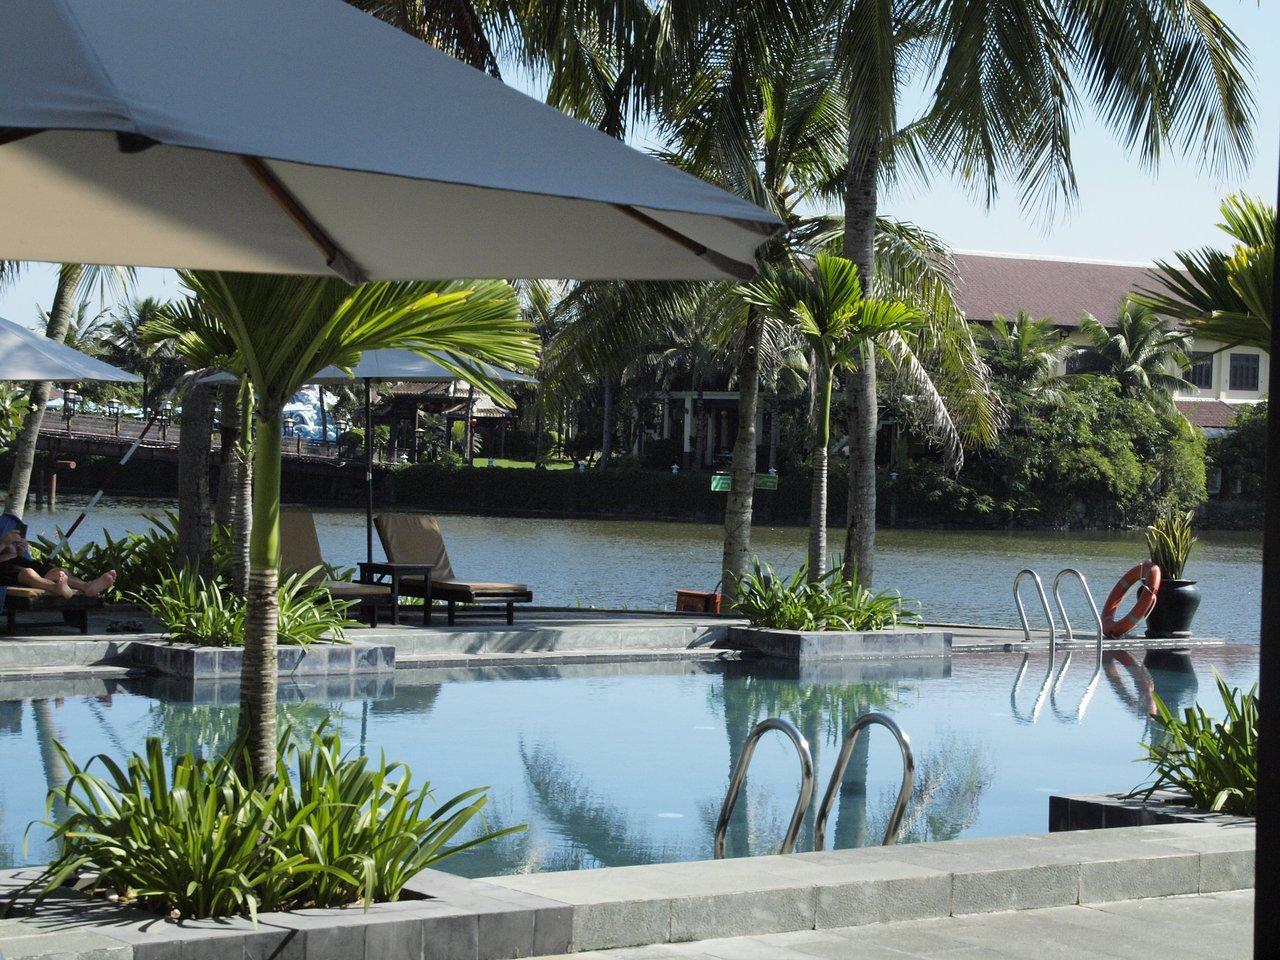 Hoi An Beach Resort Au 102 2018 Prices Reviews Vietnam Photos Of Tripadvisor